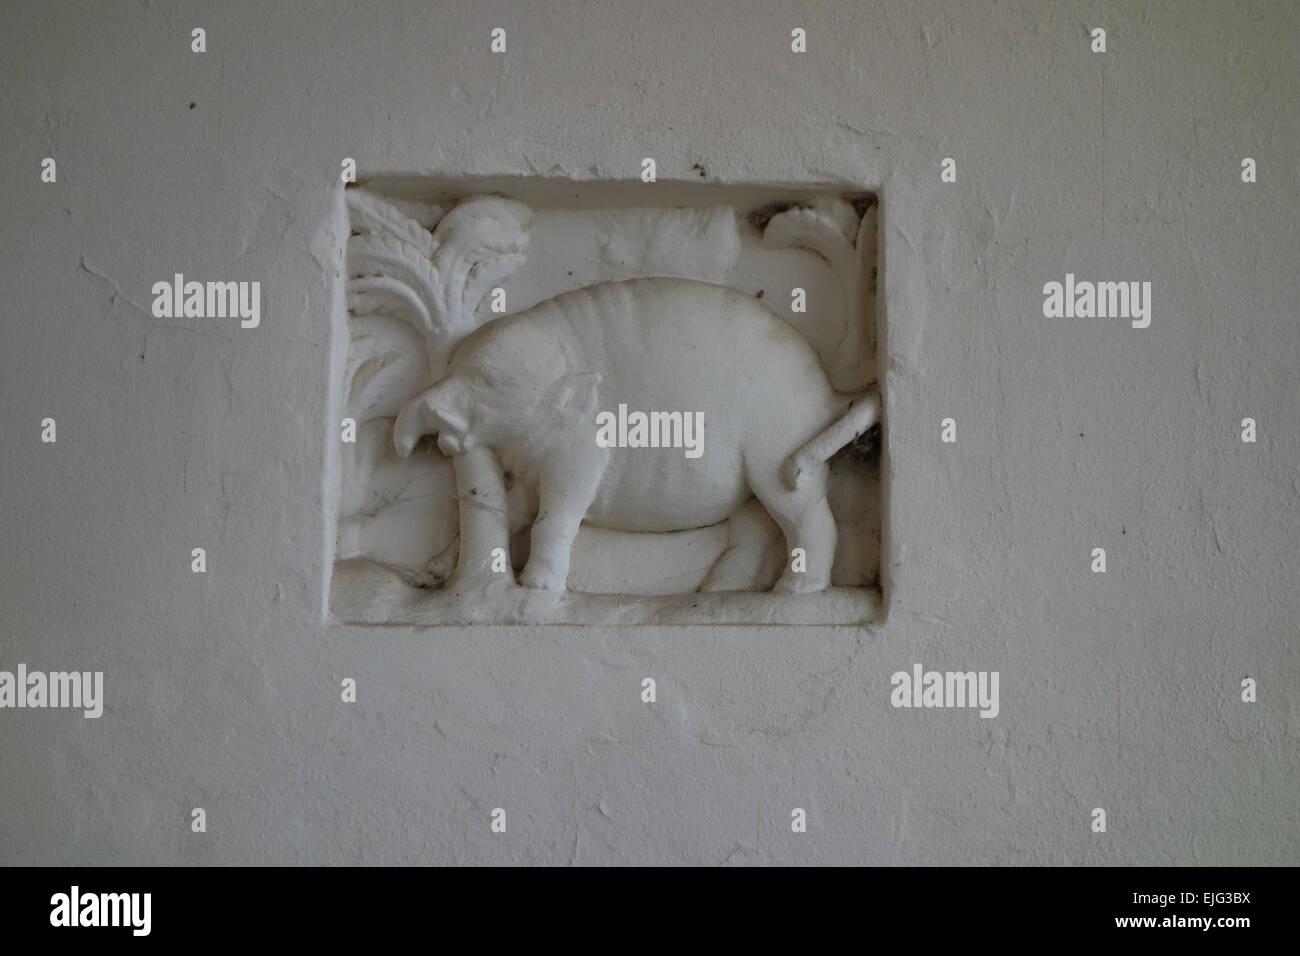 primitive little plaster elephant 17th century ornament in loggia of Bramshill Hampshire UK Zouche family mansion - Stock Image